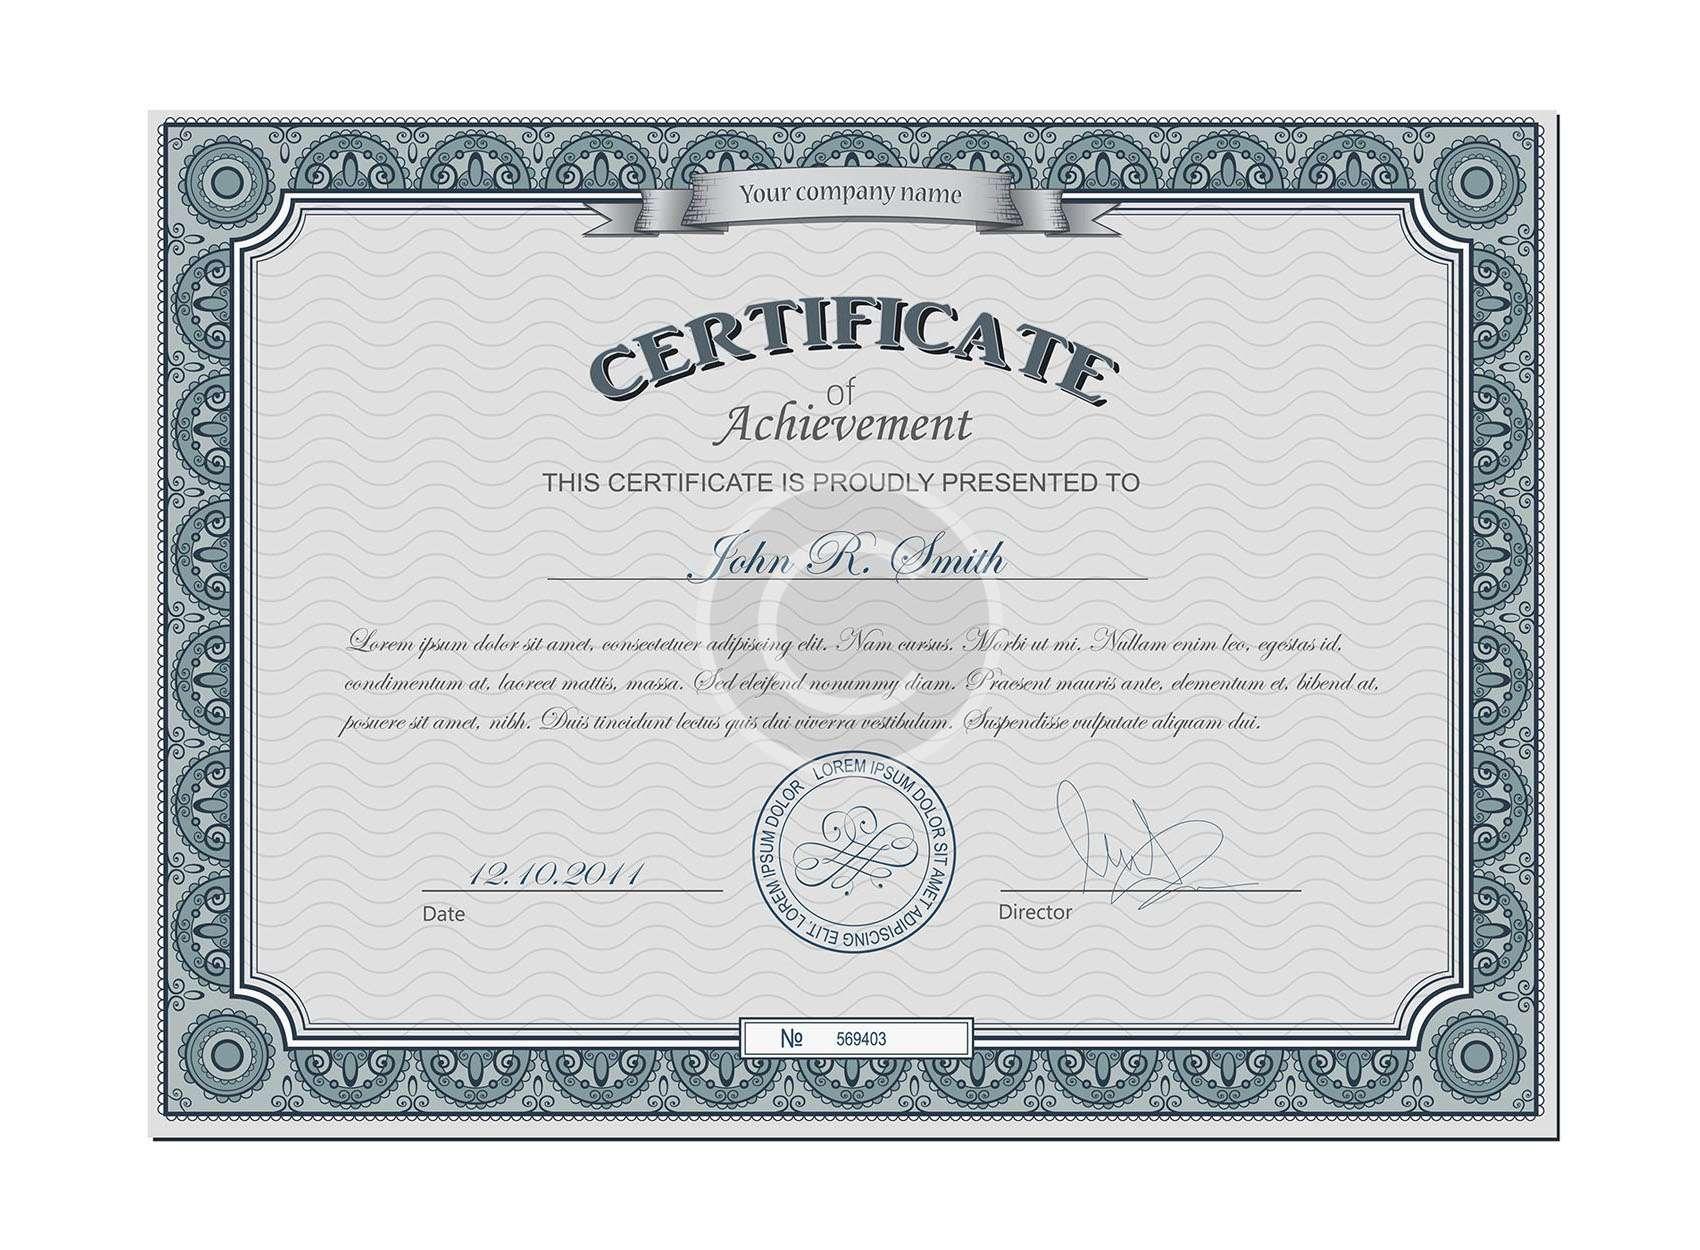 certificate1.jpg?fit=1700%2C1250&s